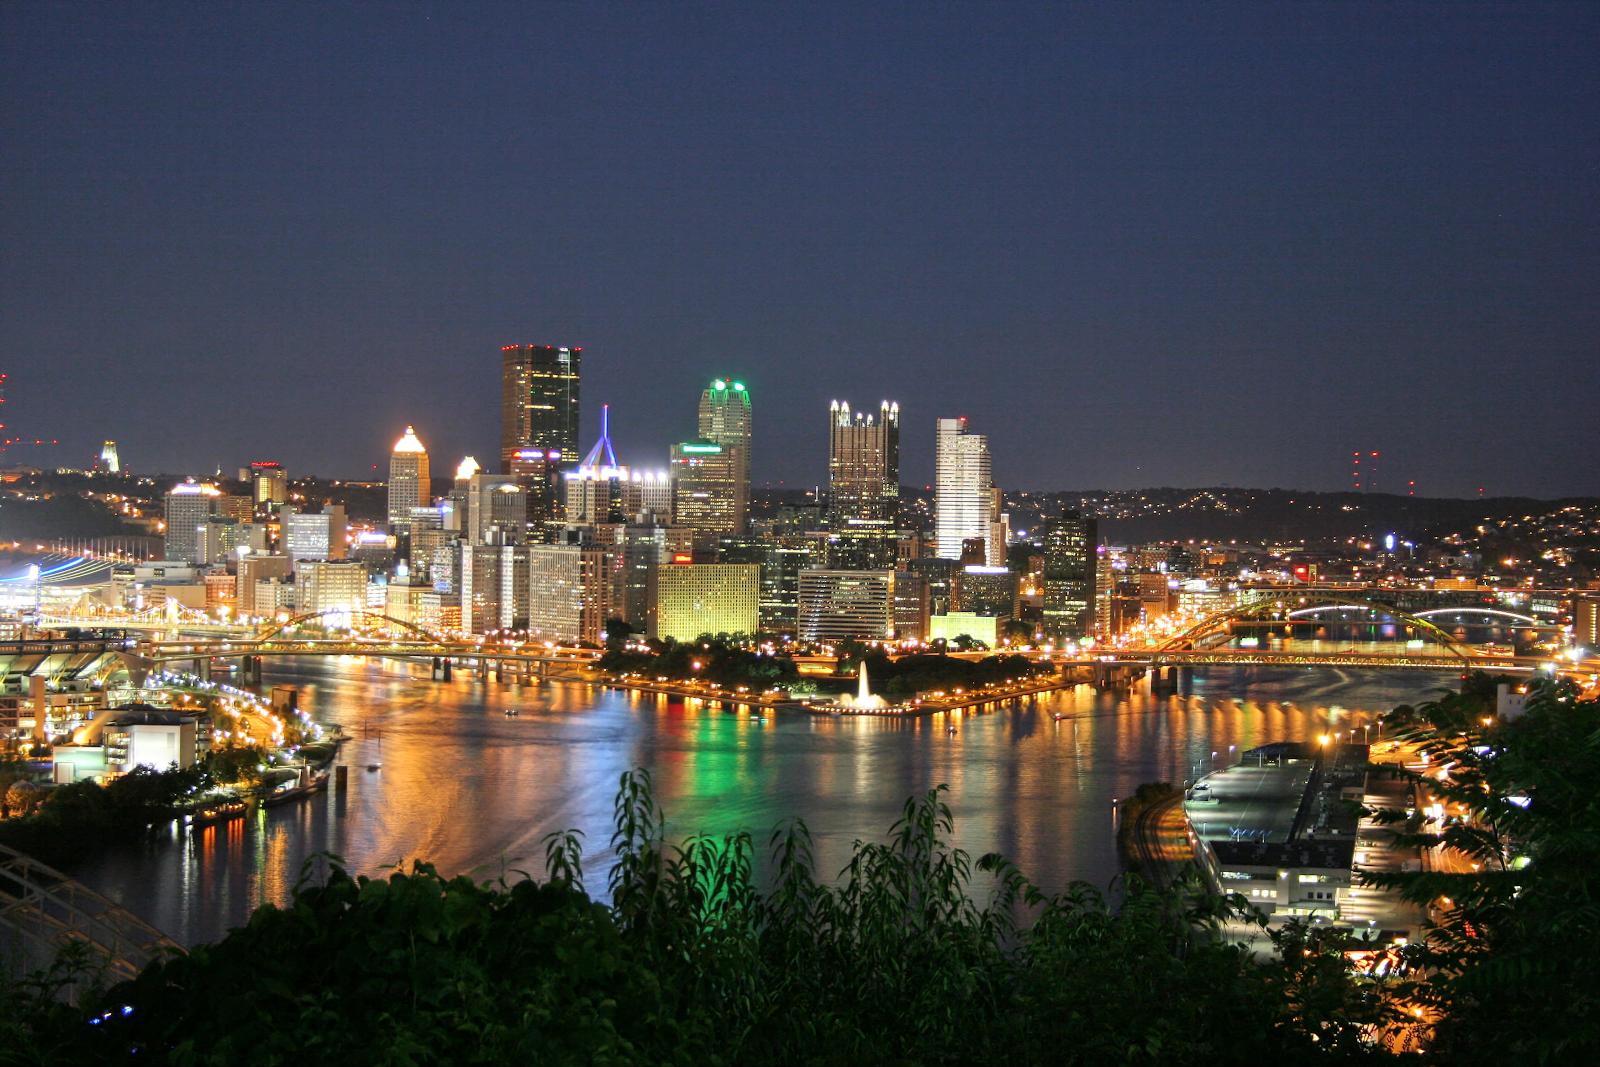 Skyline of Pittsburgh at night